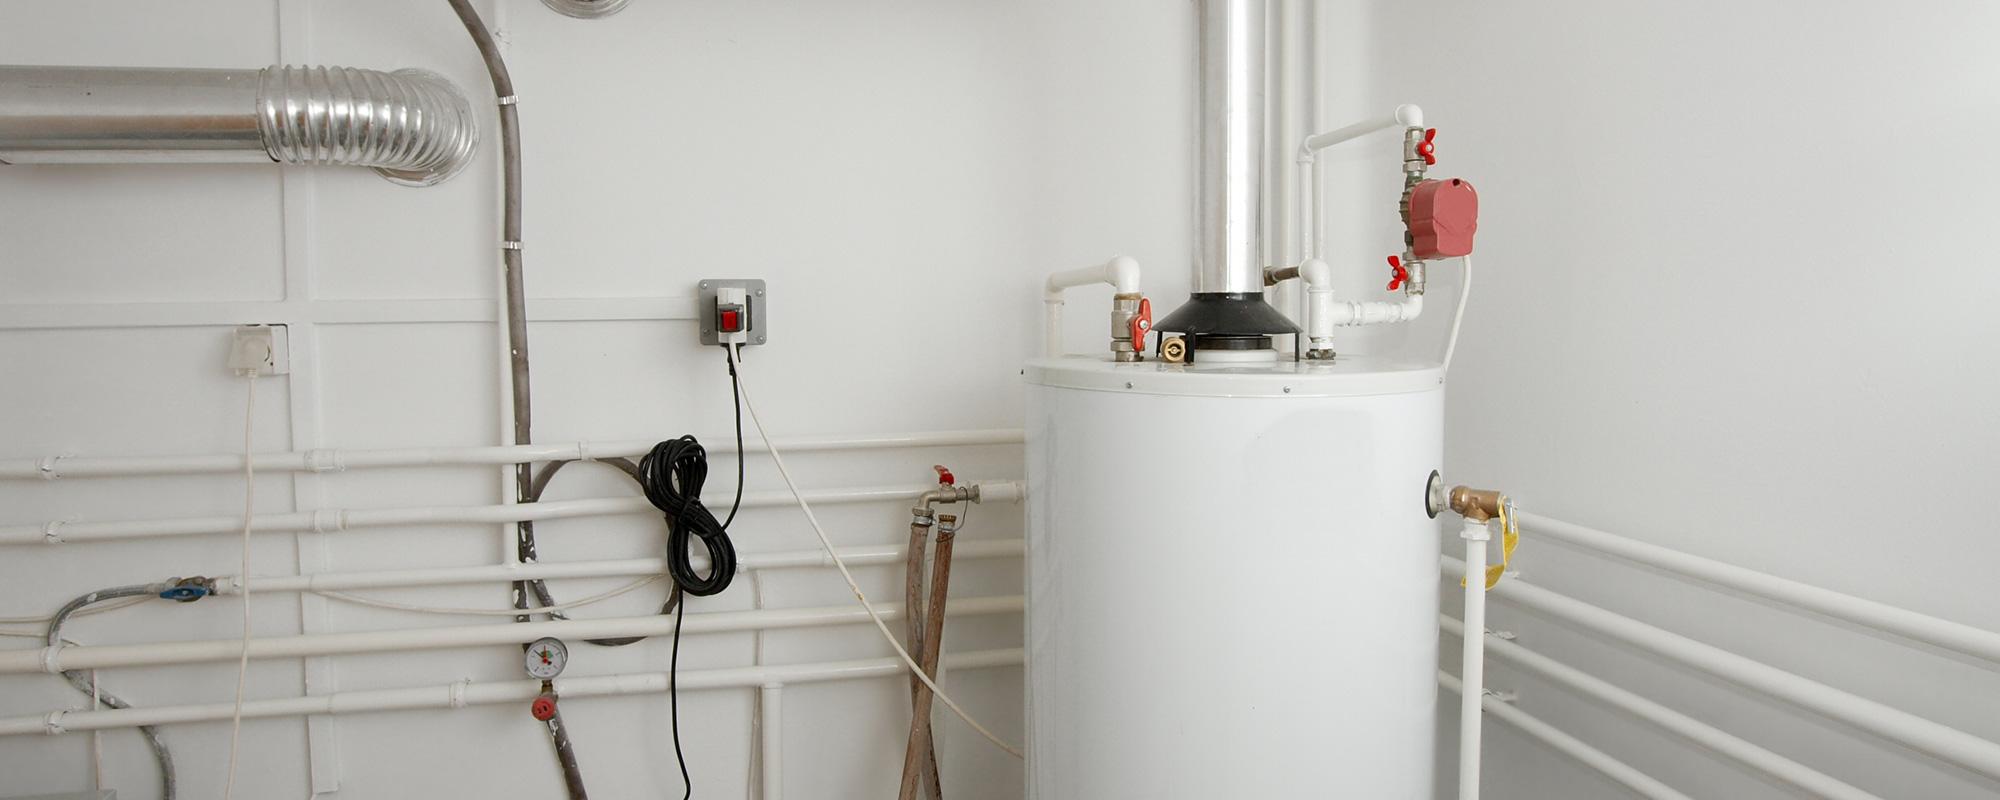 Water Heater Setup